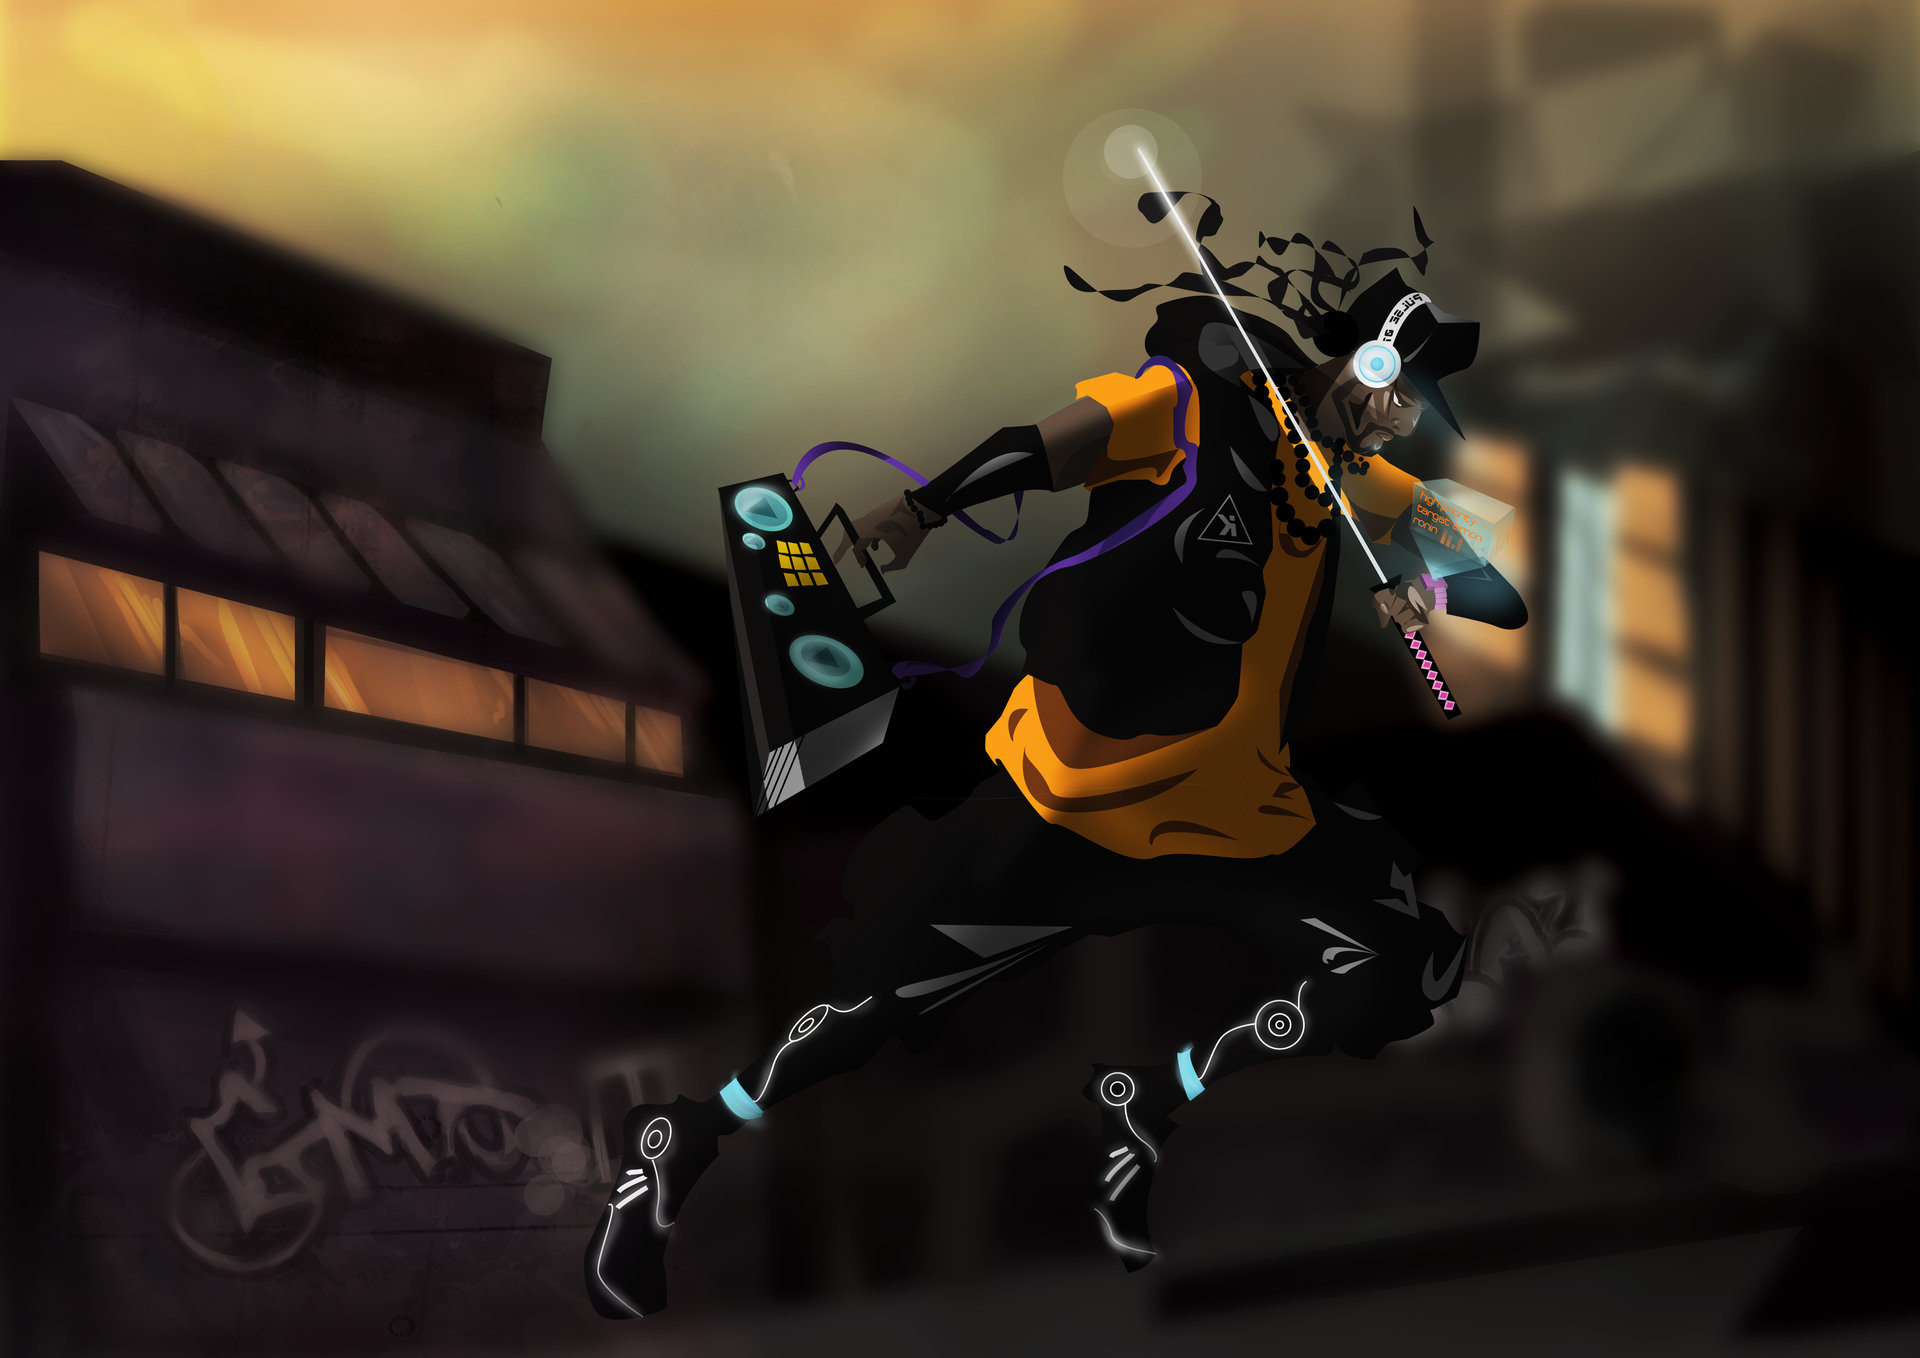 Carlo Bruzzese Urban Samurai